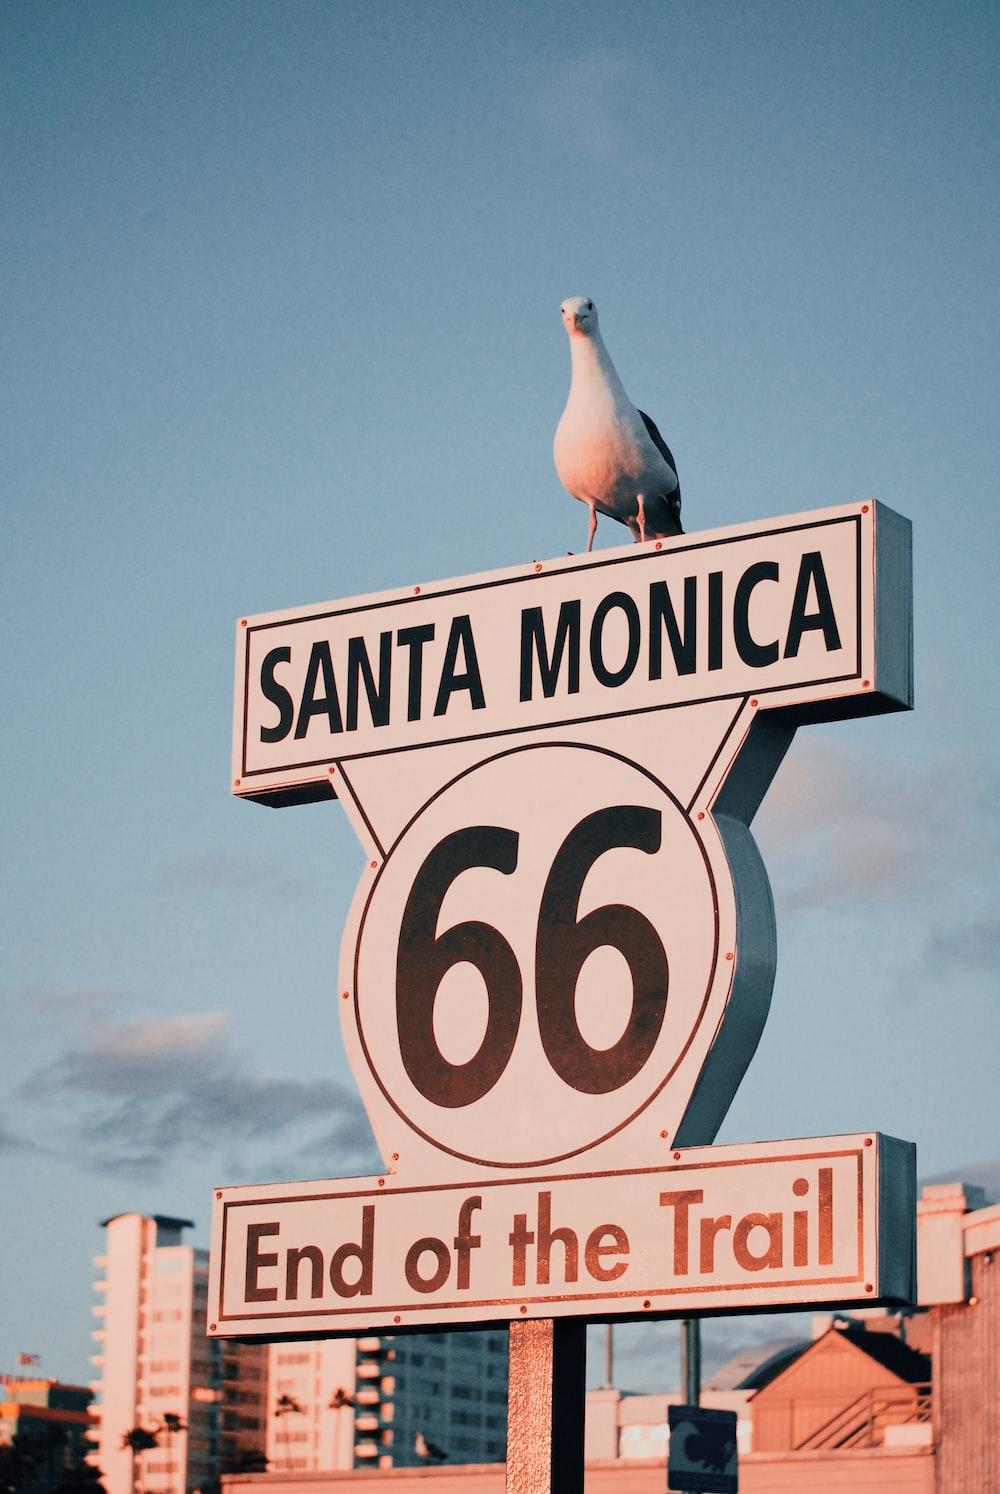 Santa Monica 66 signage